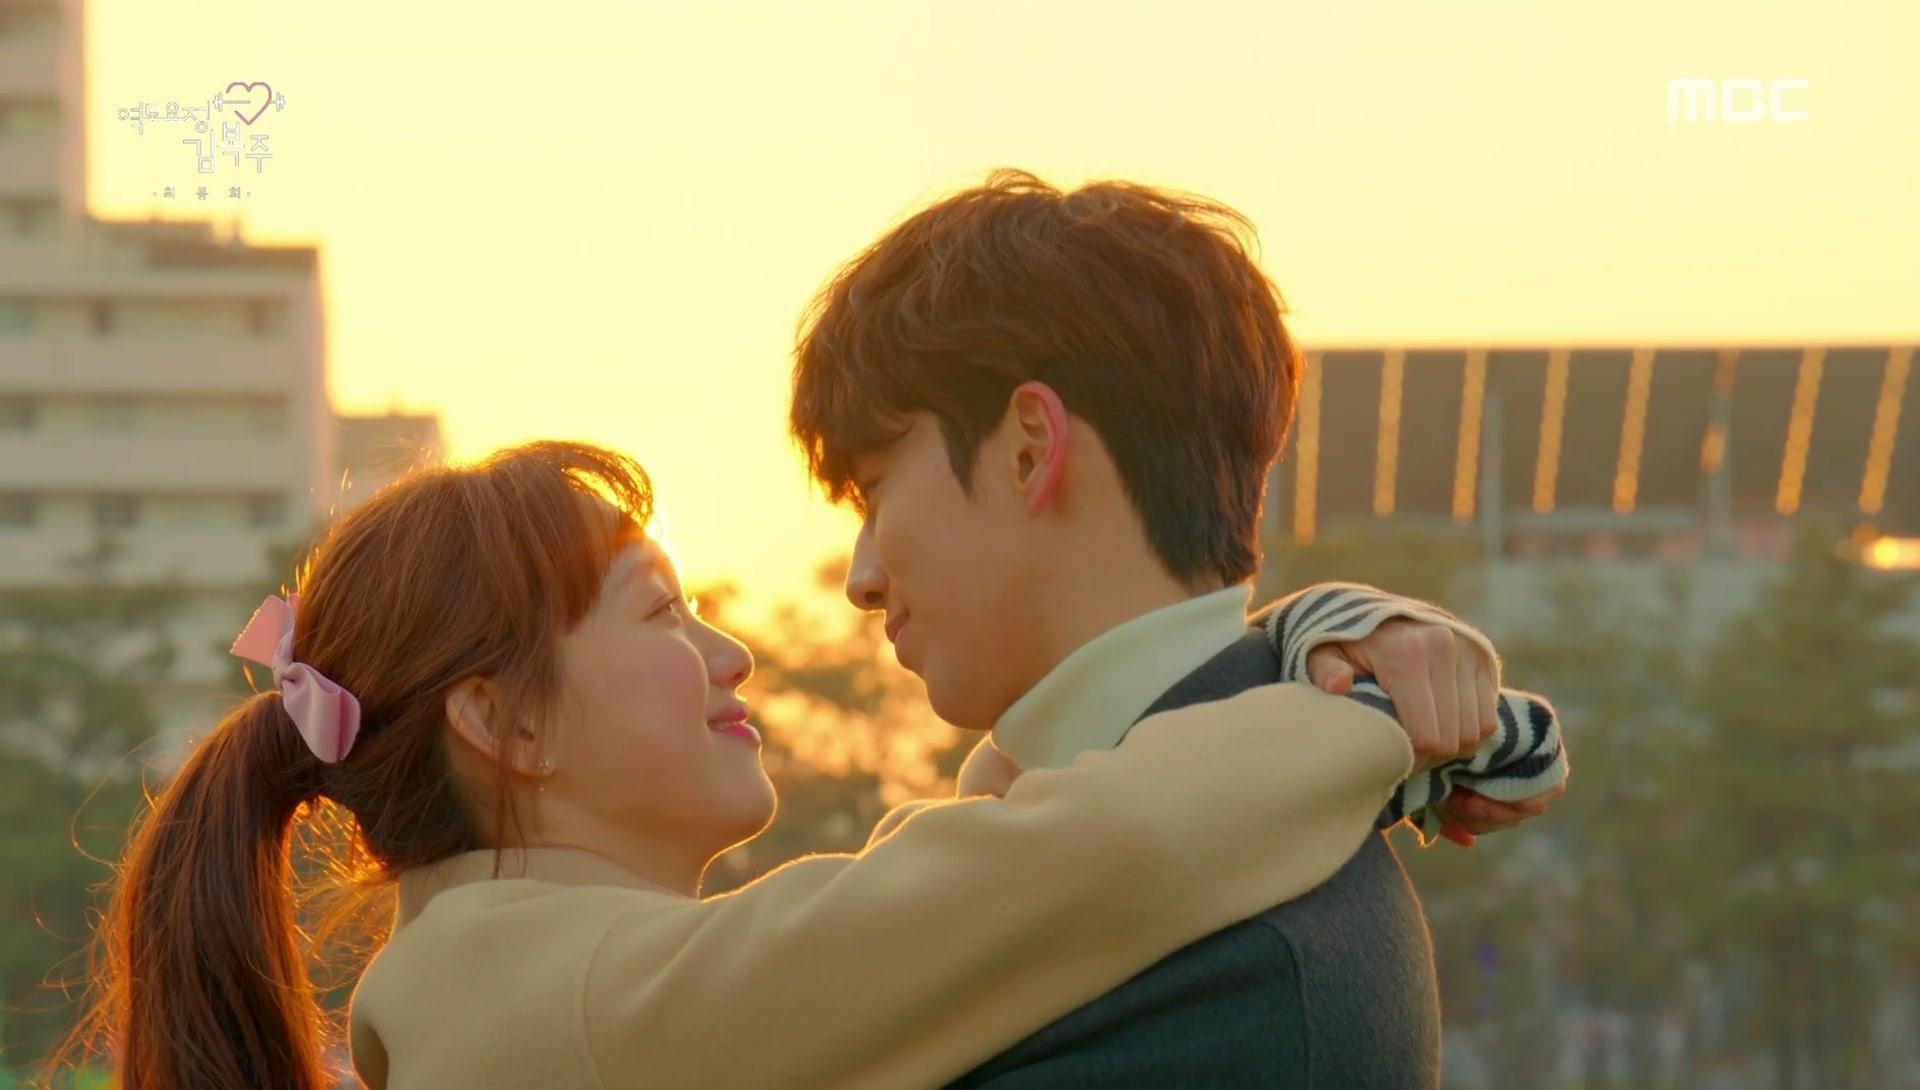 8 increíblemente refrescantes K-Dramas que queremos ver más